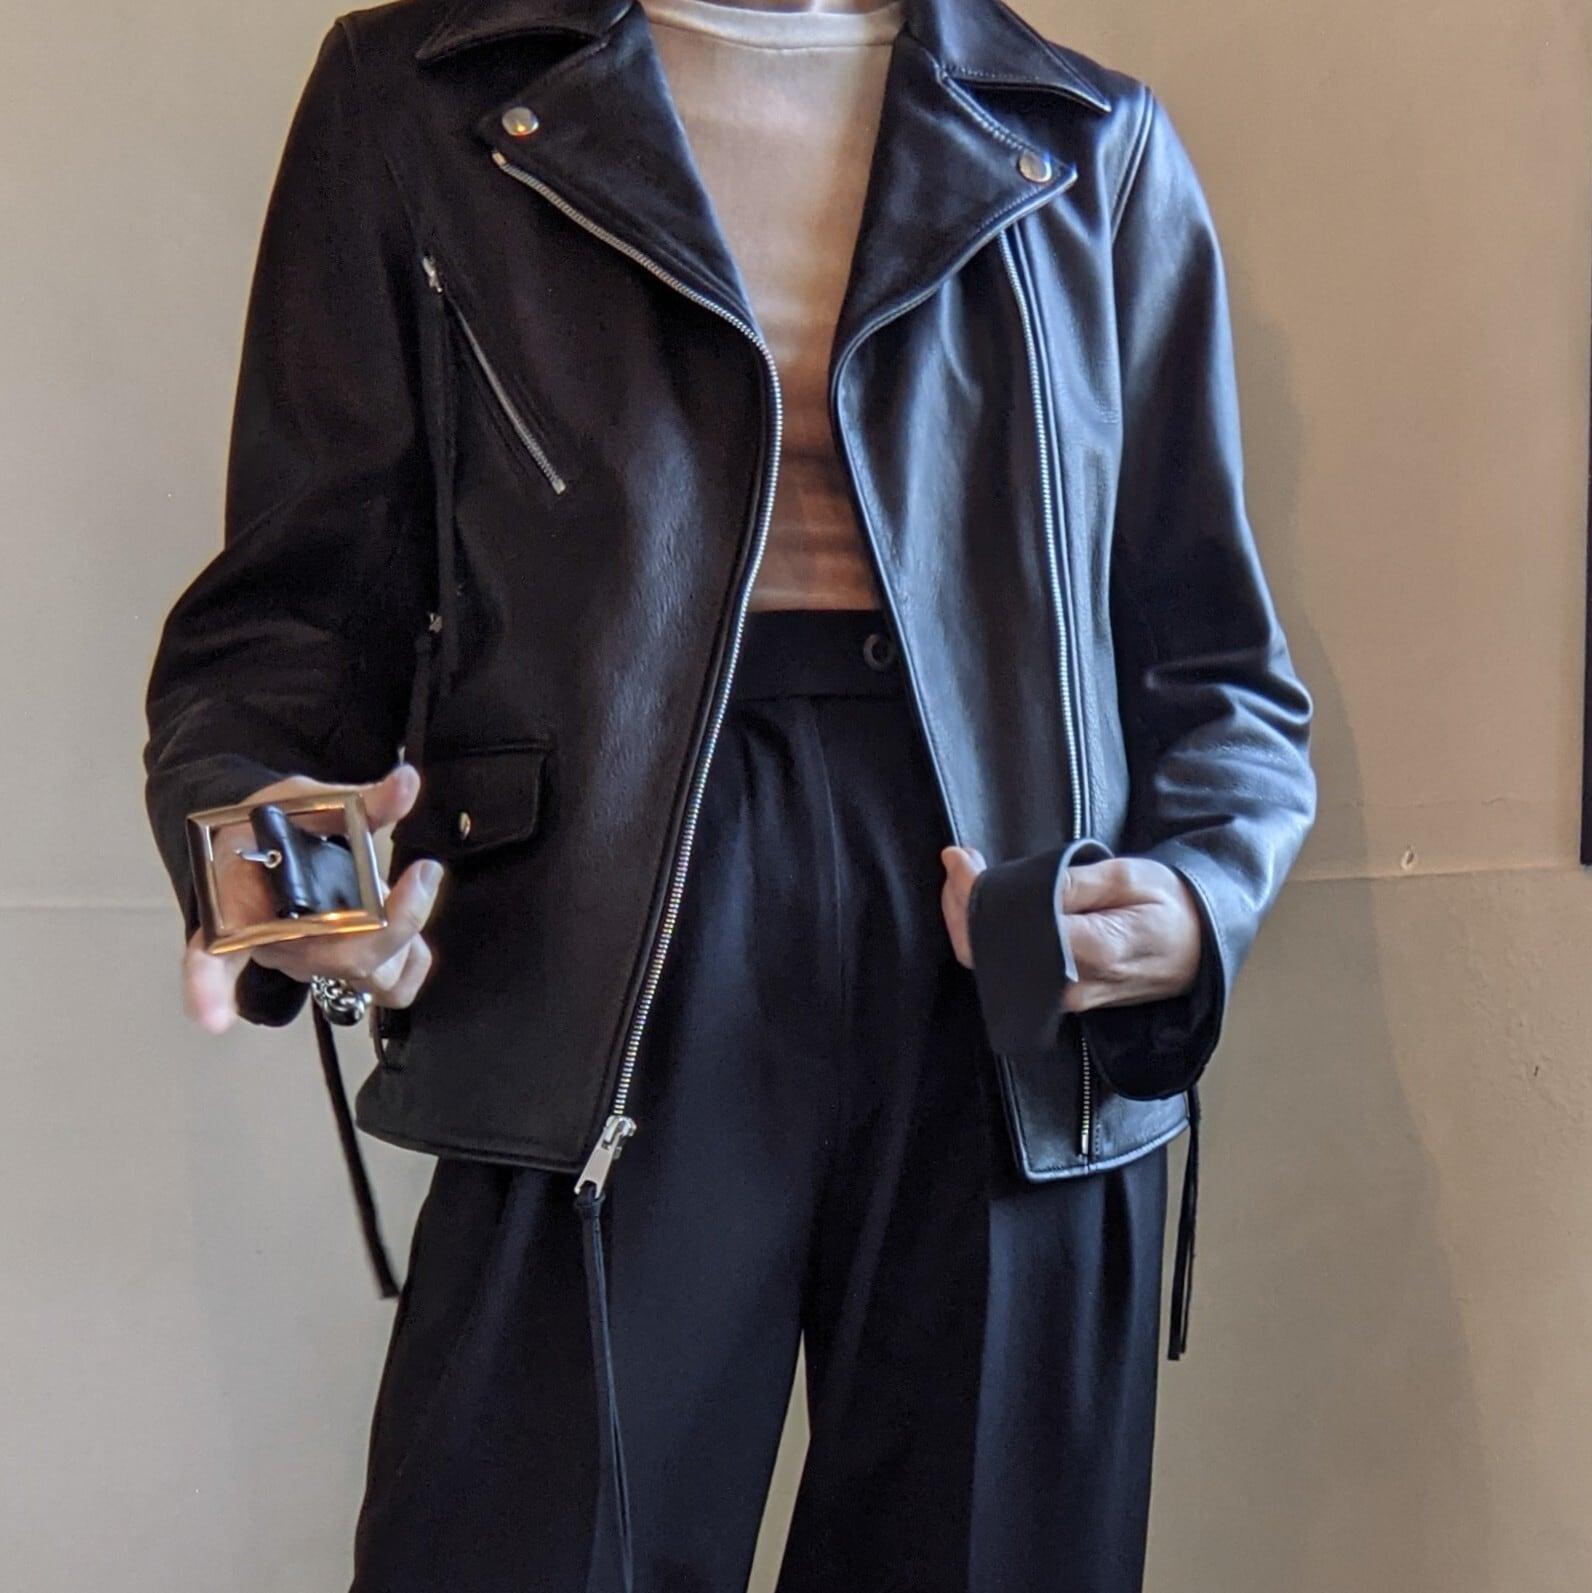 【 NoiSECRAFT 】ノイズクラフト / Riders jacket / レザージャケット / BLACK / S size